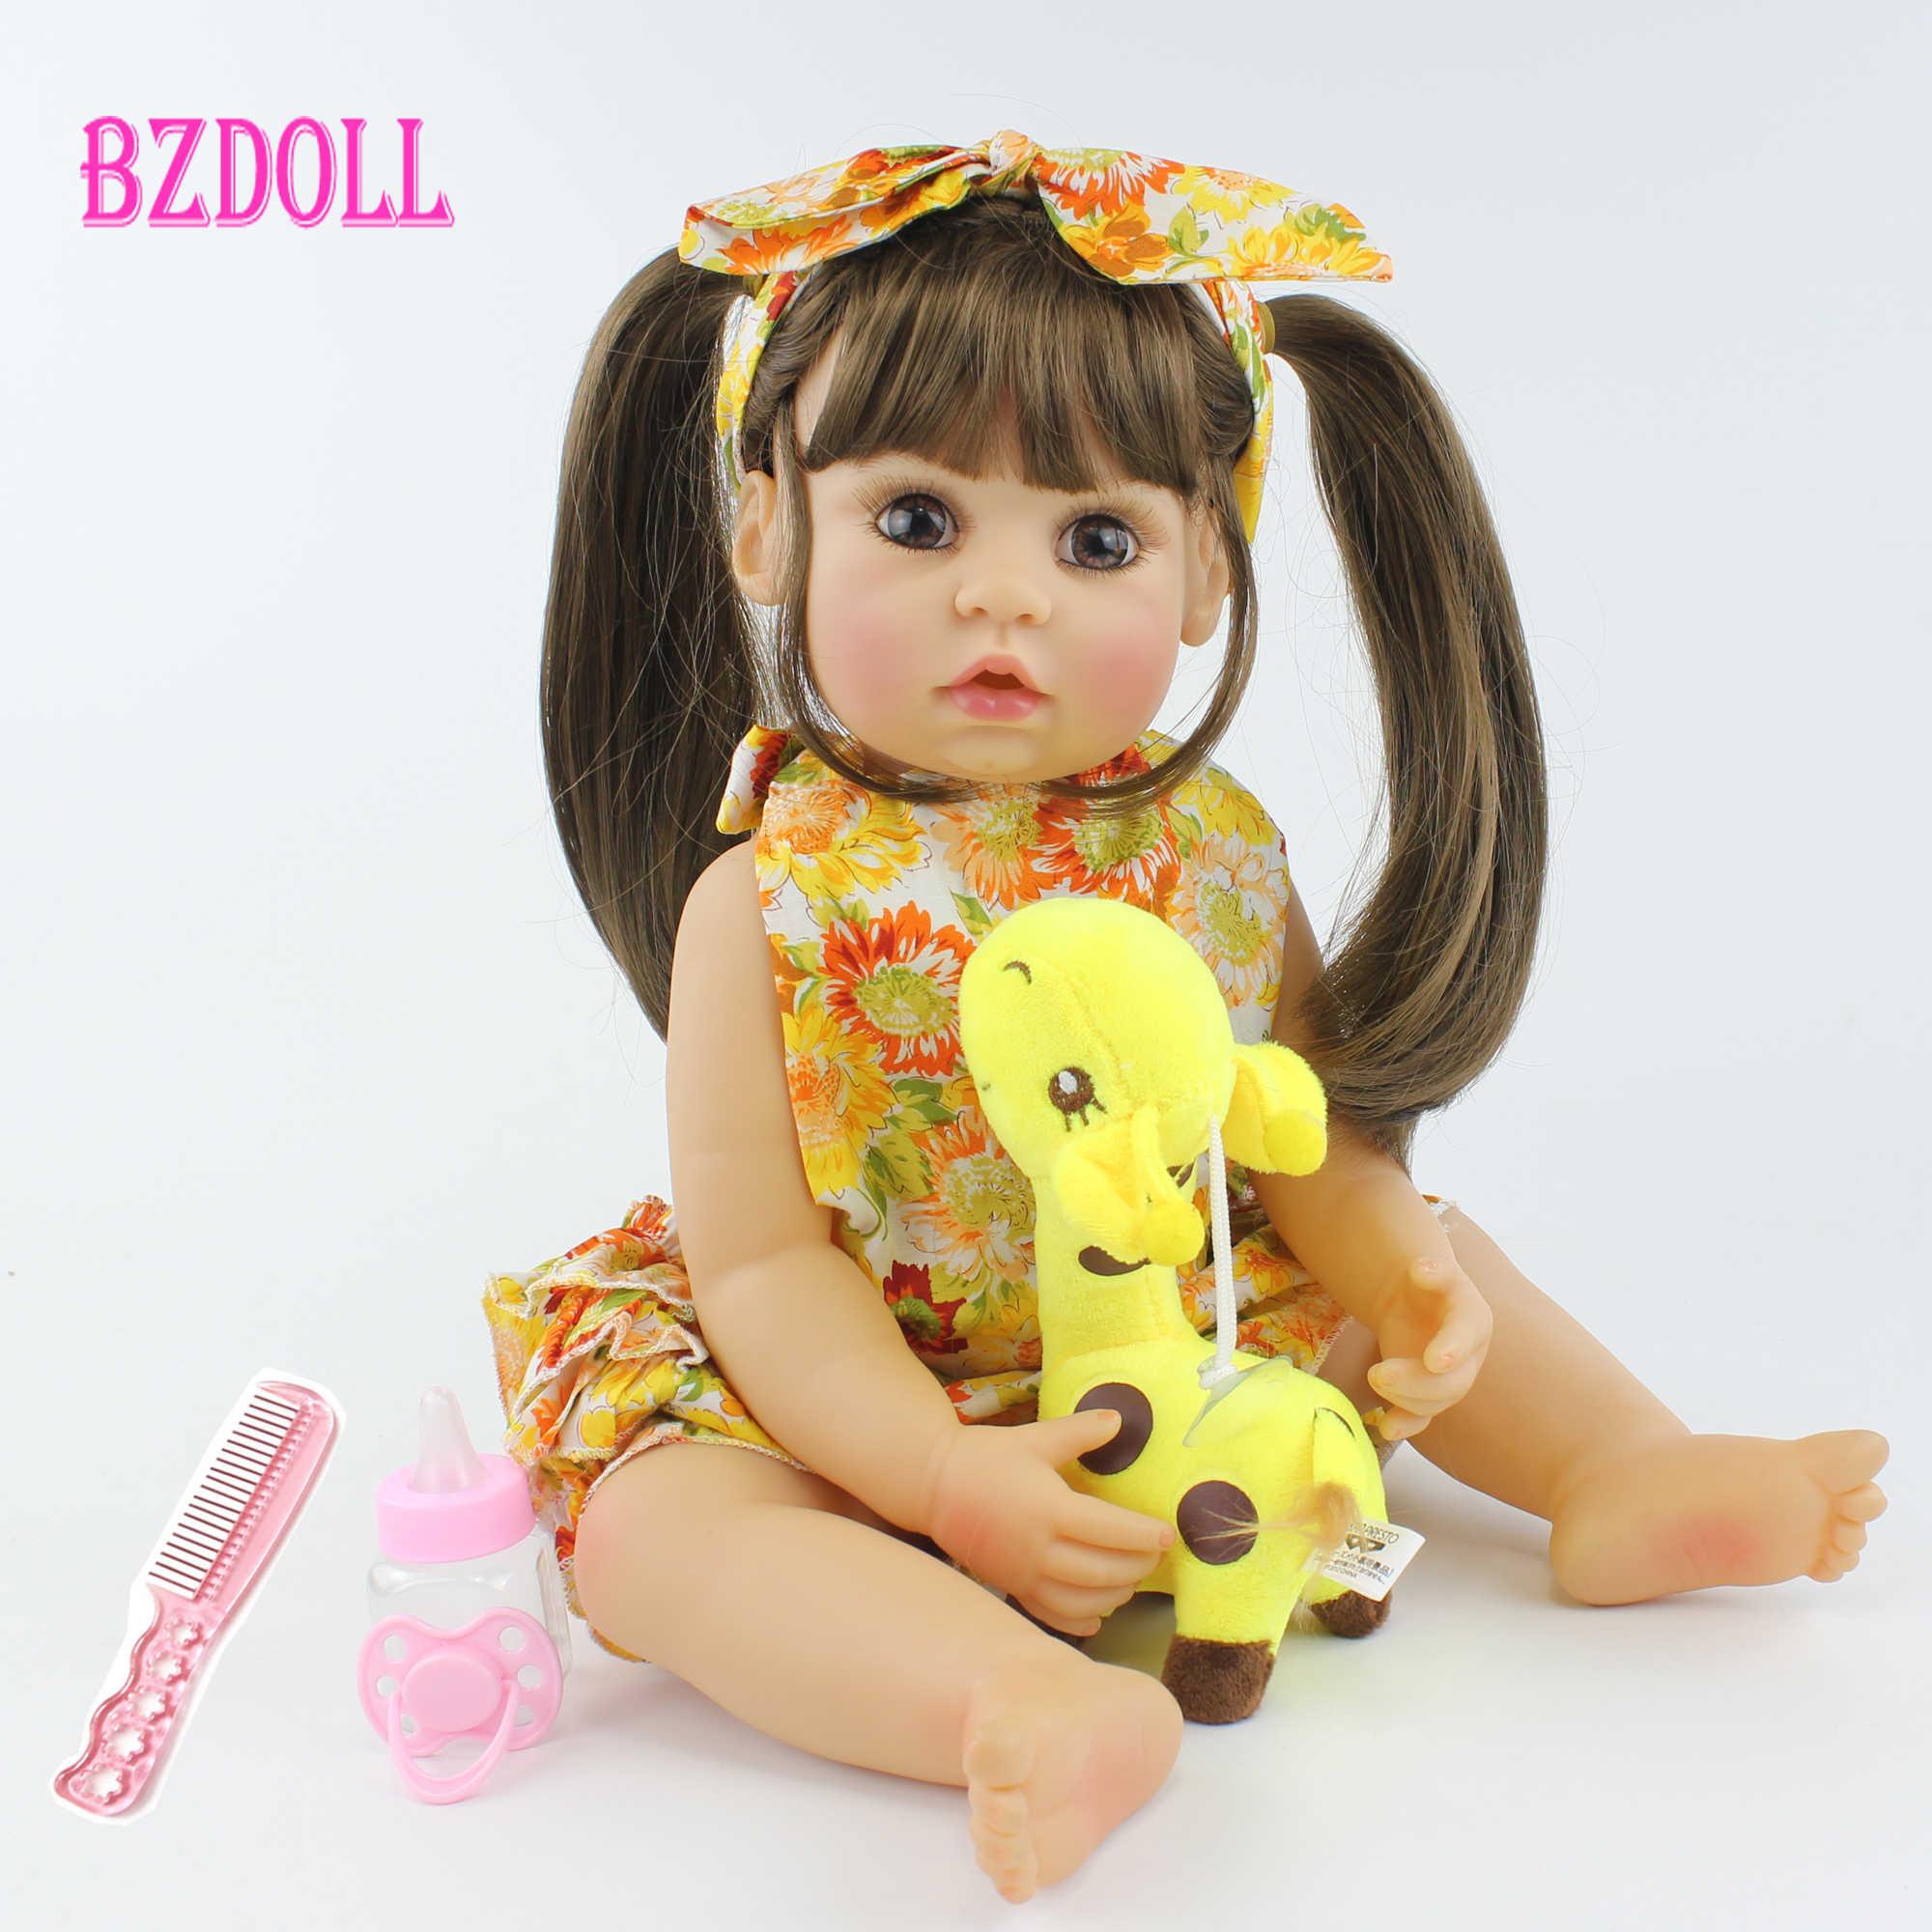 55cm מלא גוף סיליקון Reborn תינוק בובת צעצוע מציאותי 22 אינץ ויניל בחיים תינוקות להתלבש נסיכת פעוט ילדה יום הולדת מתנה